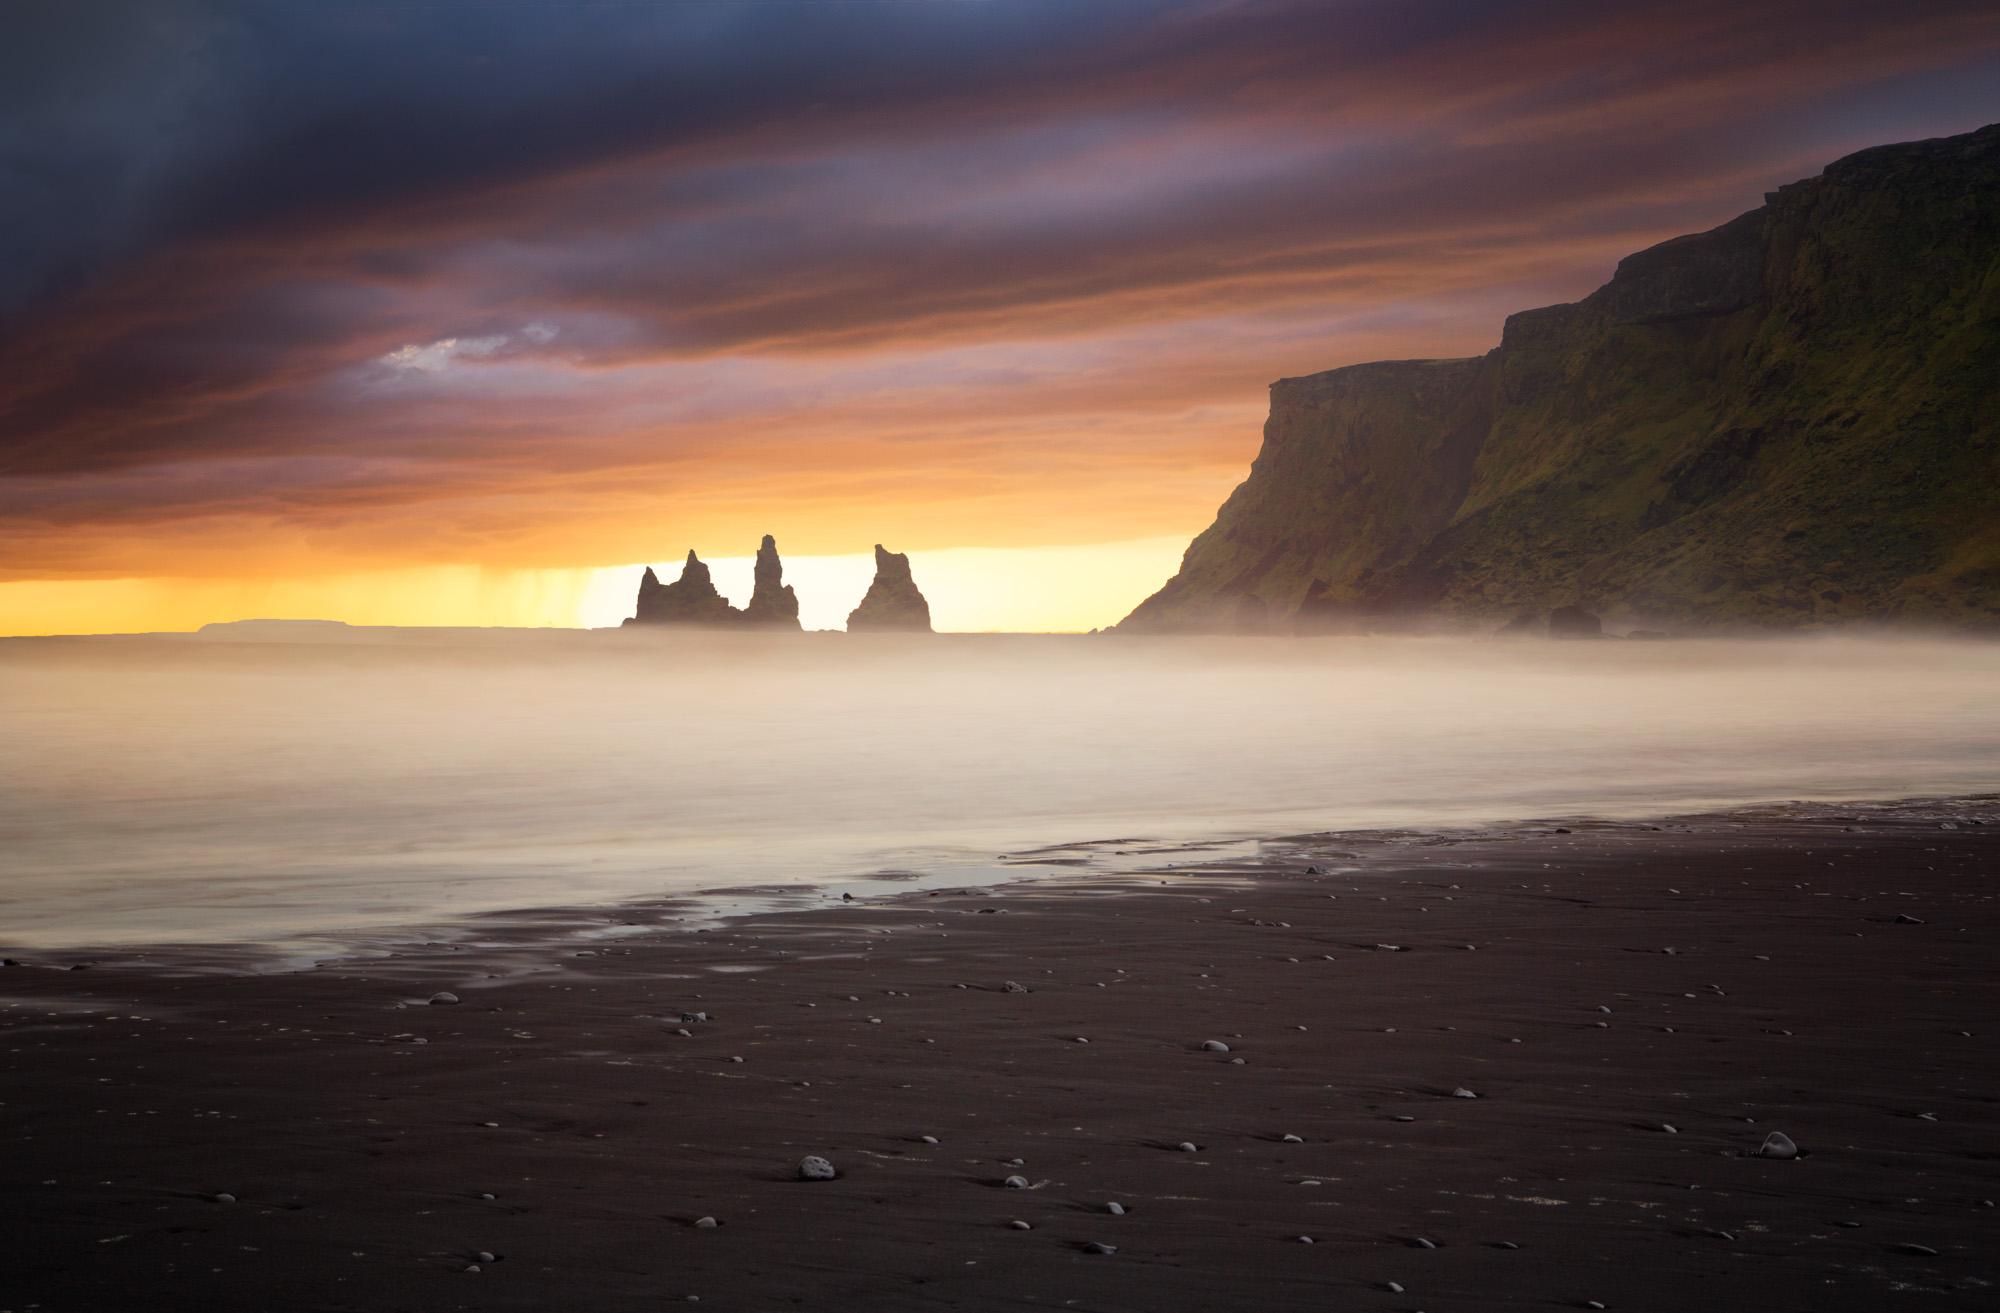 minimal long exposure photograph of a sunset in Reynisfjara Iceland